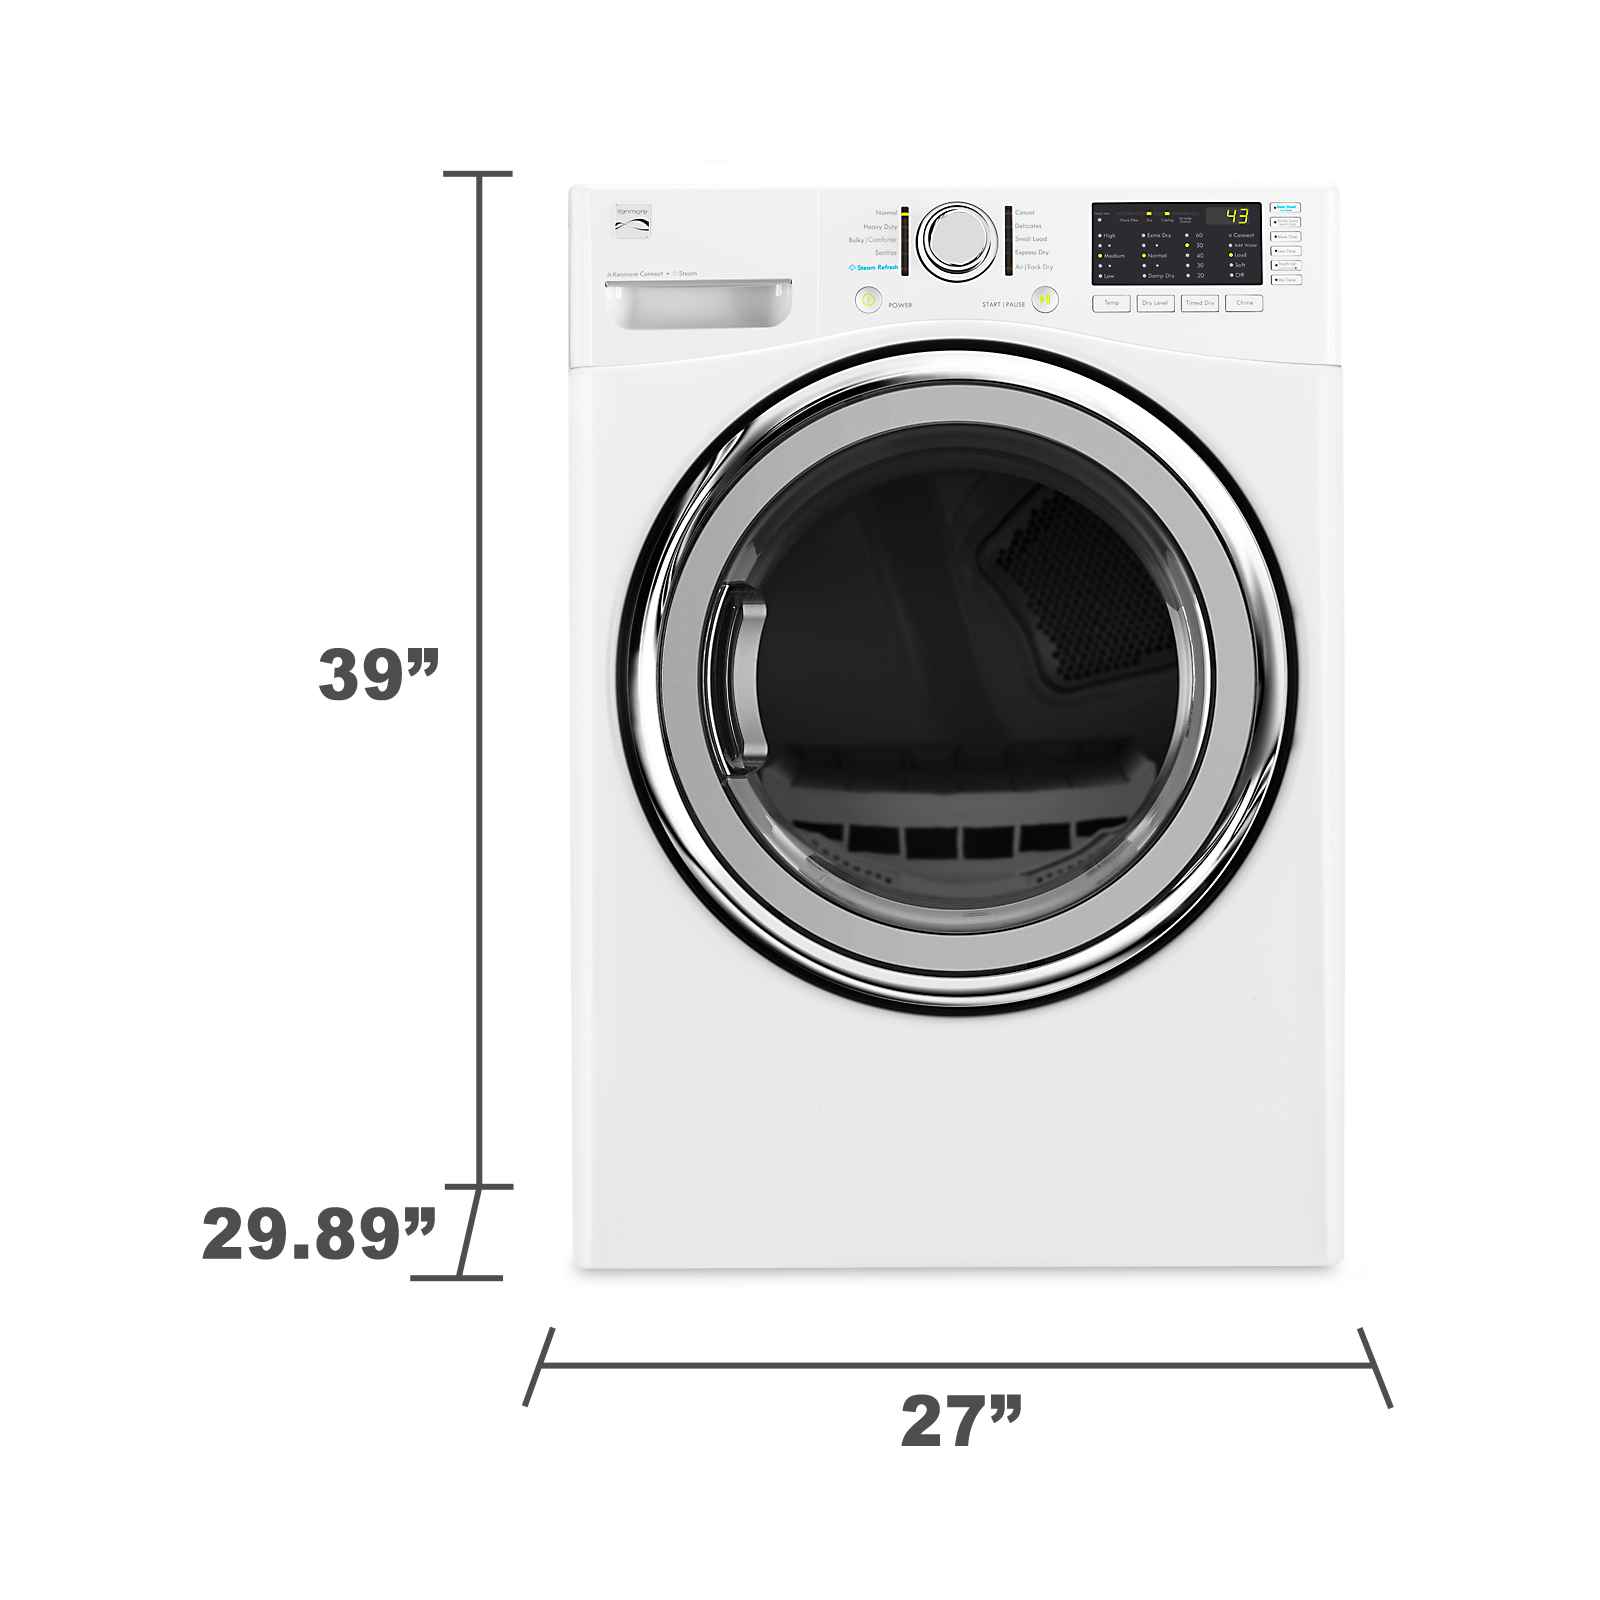 Kenmore 91382 7.4 cu. ft. Gas Dryer w/ Steam - White